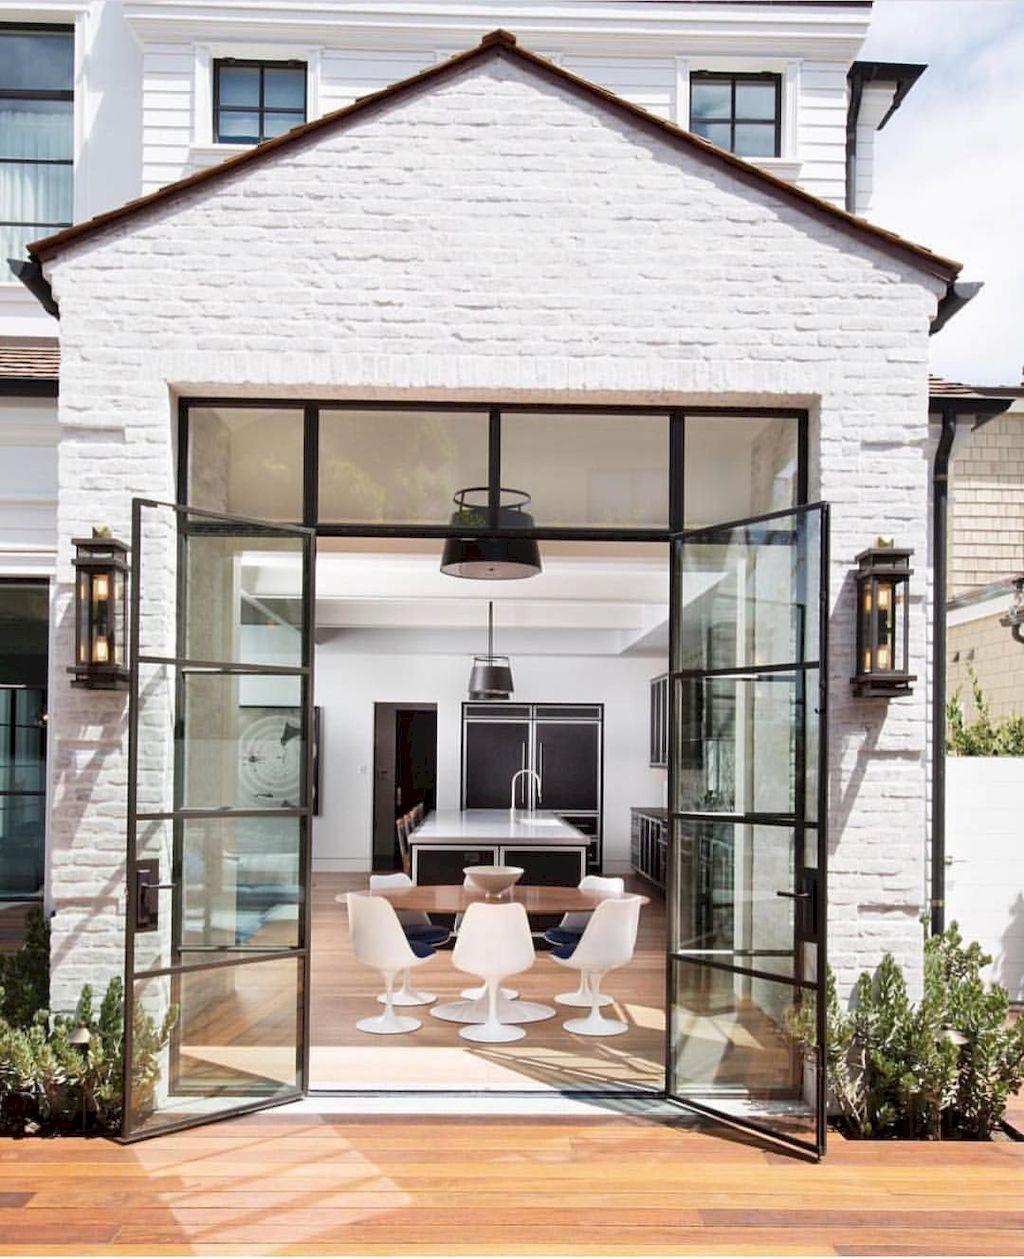 Awesome 90 Incredible Modern Farmhouse Exterior Design Ideas Https Roomadness Com 2017 White Exterior Houses Modern Farmhouse Exterior House Designs Exterior